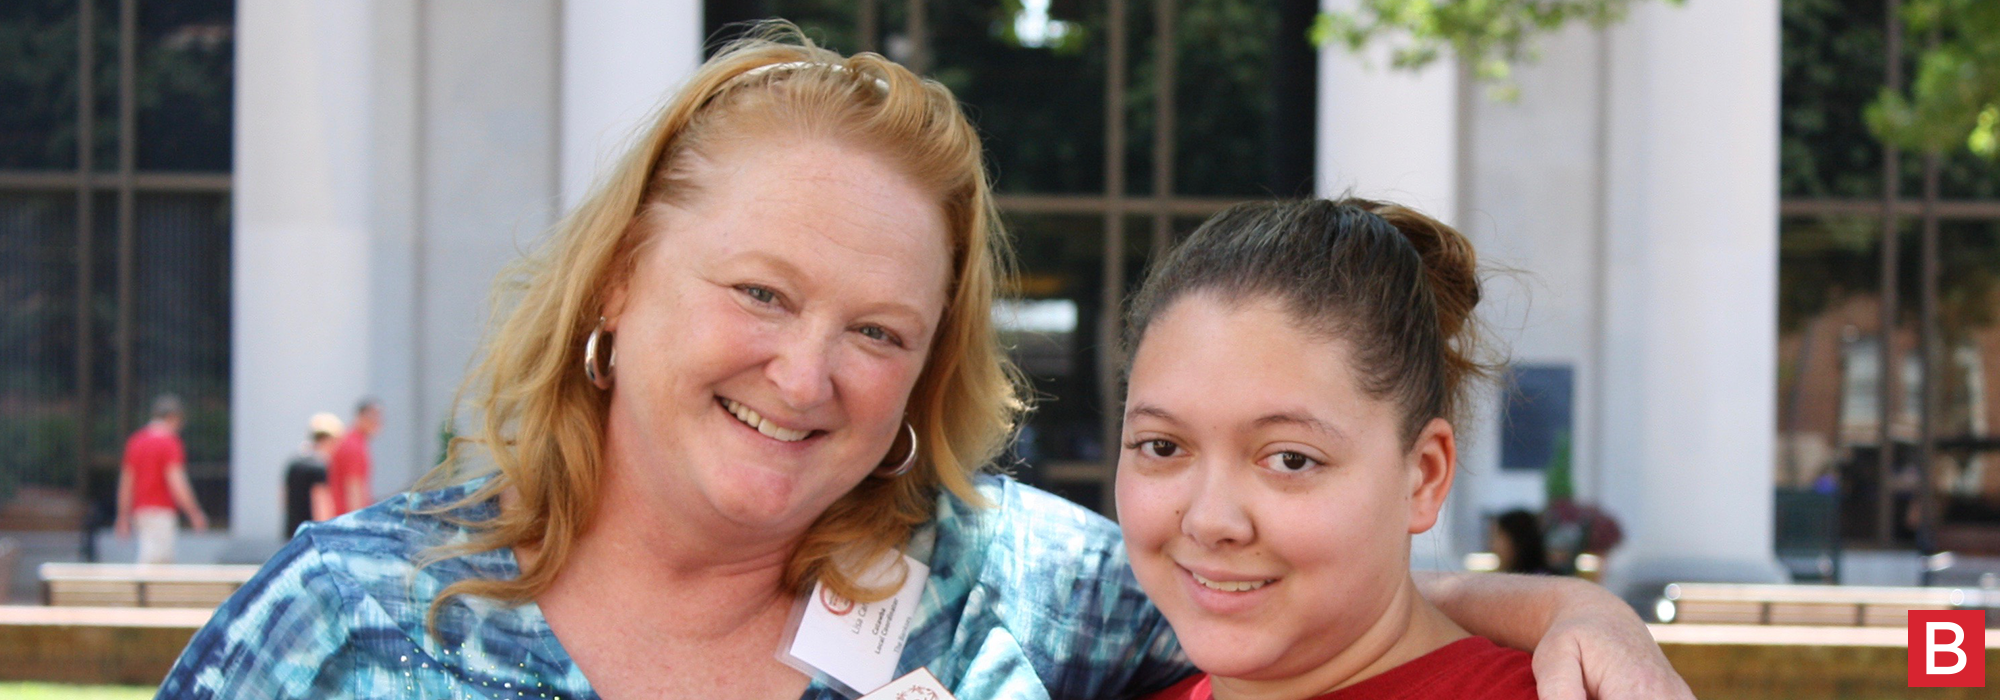 Lisa Carroll and her daughter, Sabrina